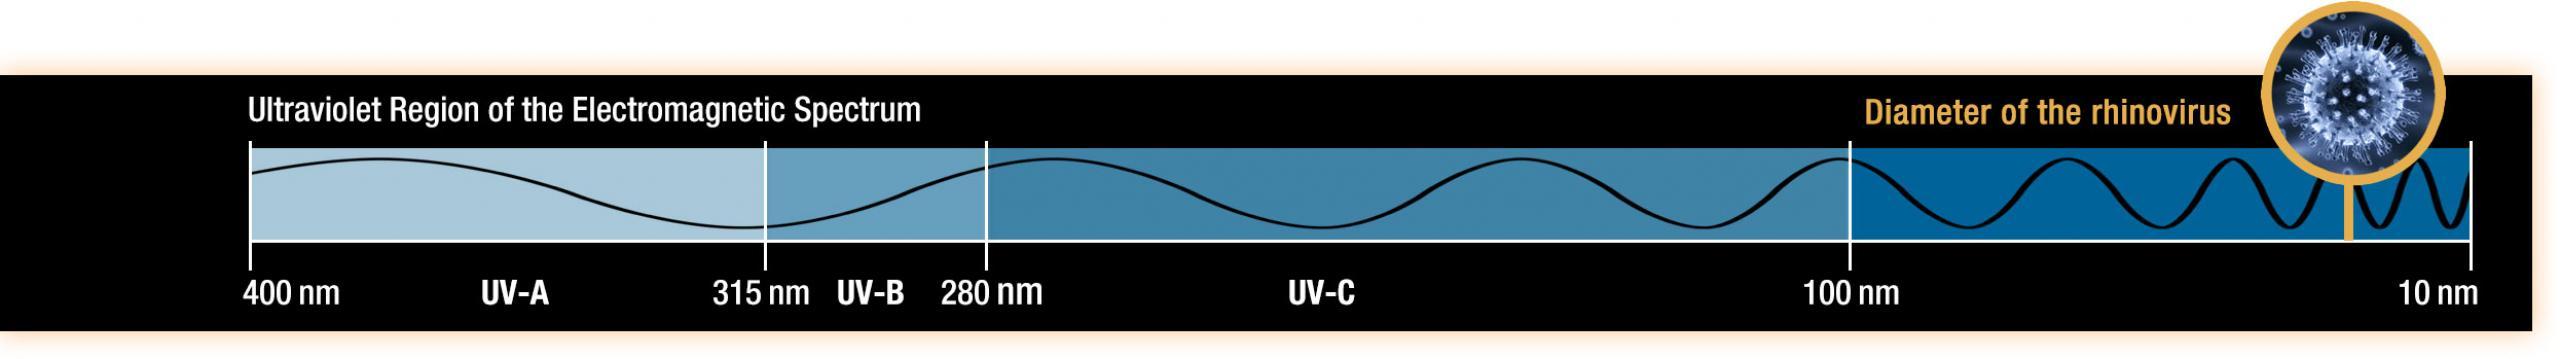 Ultraviolet Waves | Science Mission Directorate